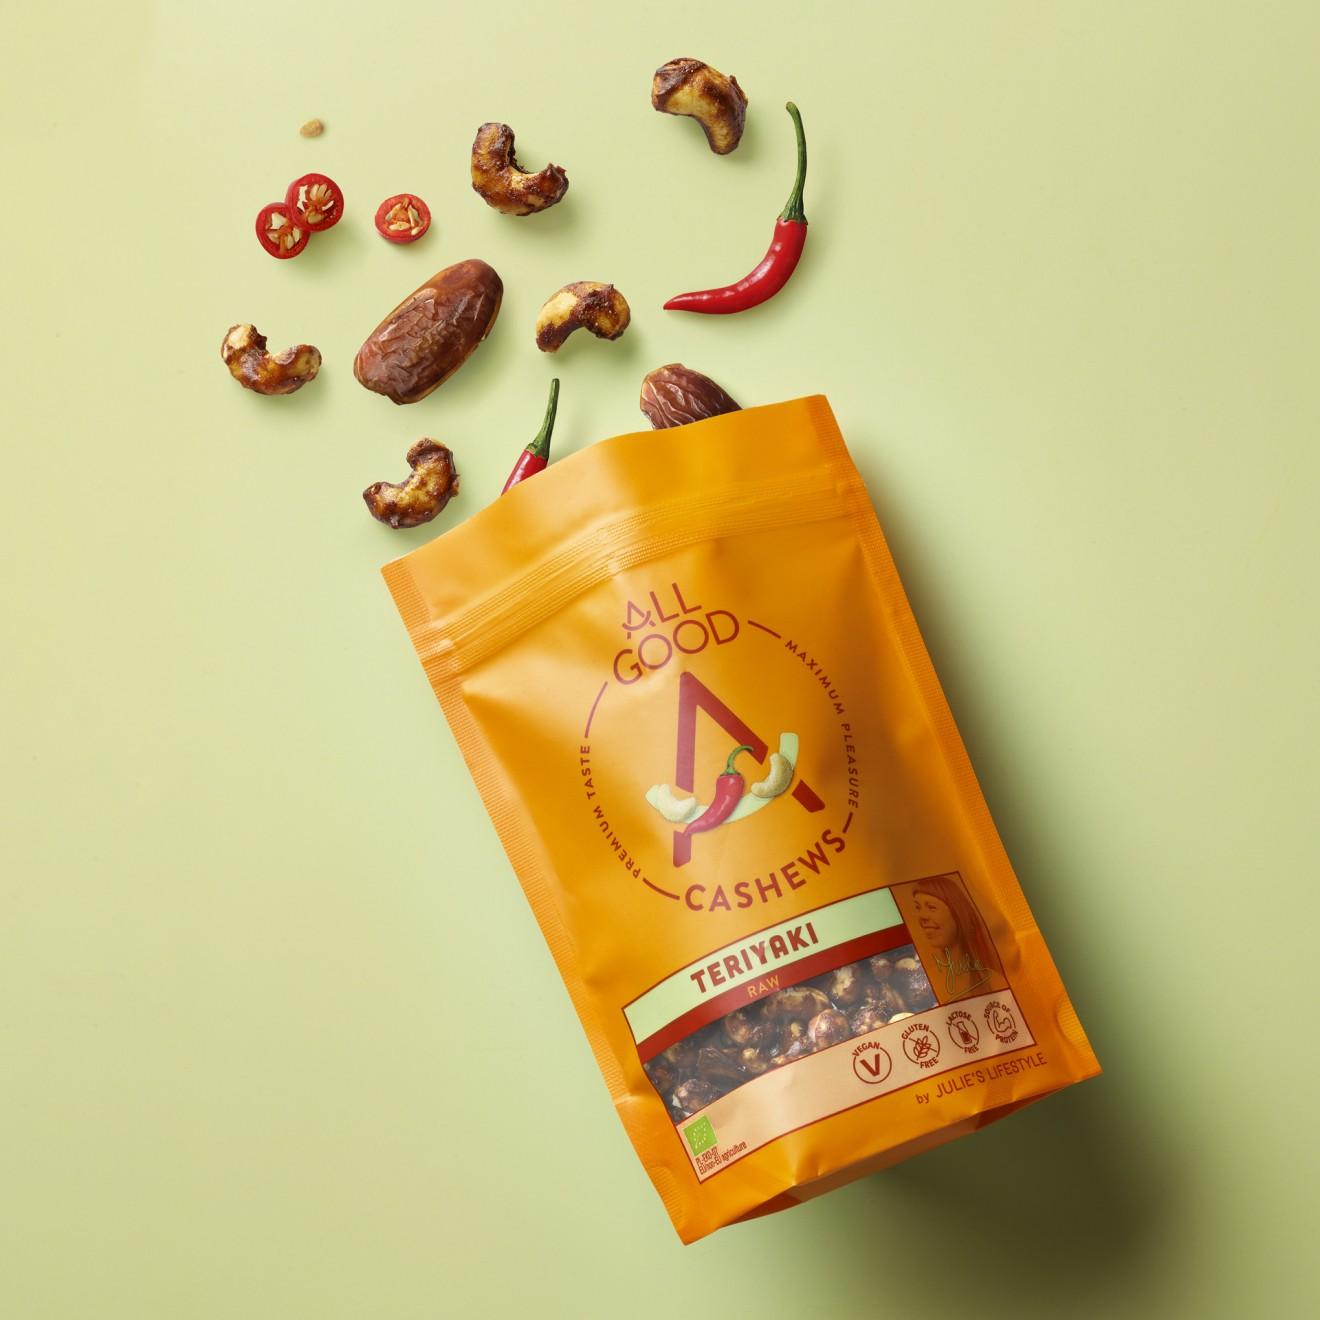 Quatre Mains package design - cashew, chili, dates, crackers, nuts